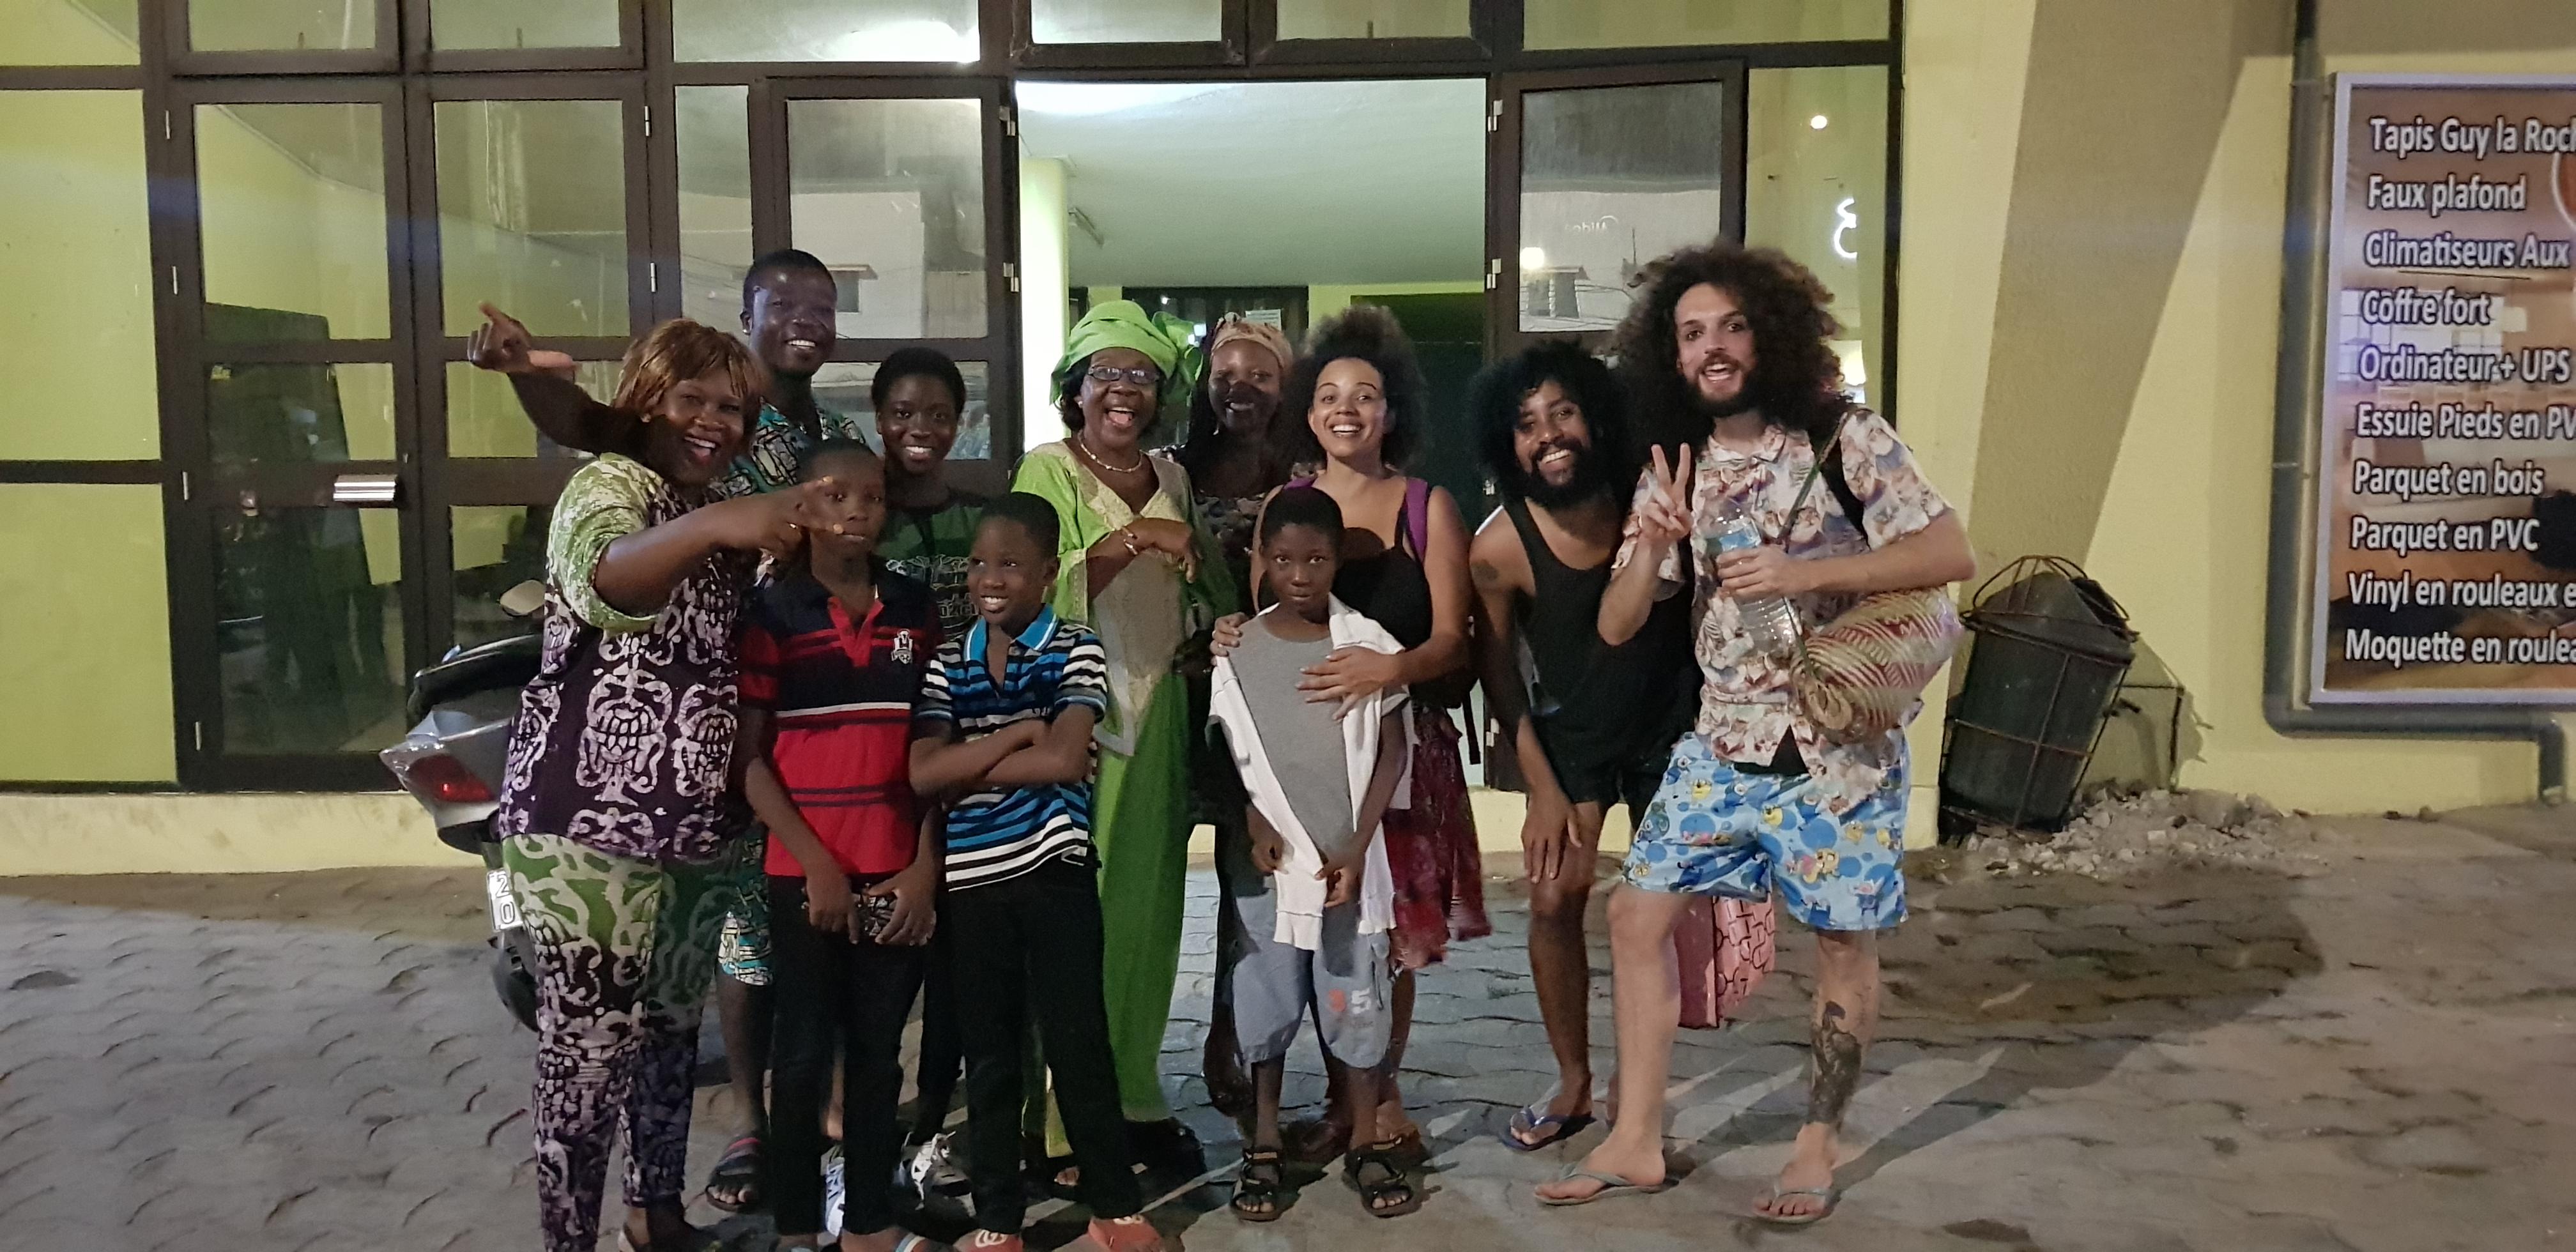 Maida Festival com Familia Locossou